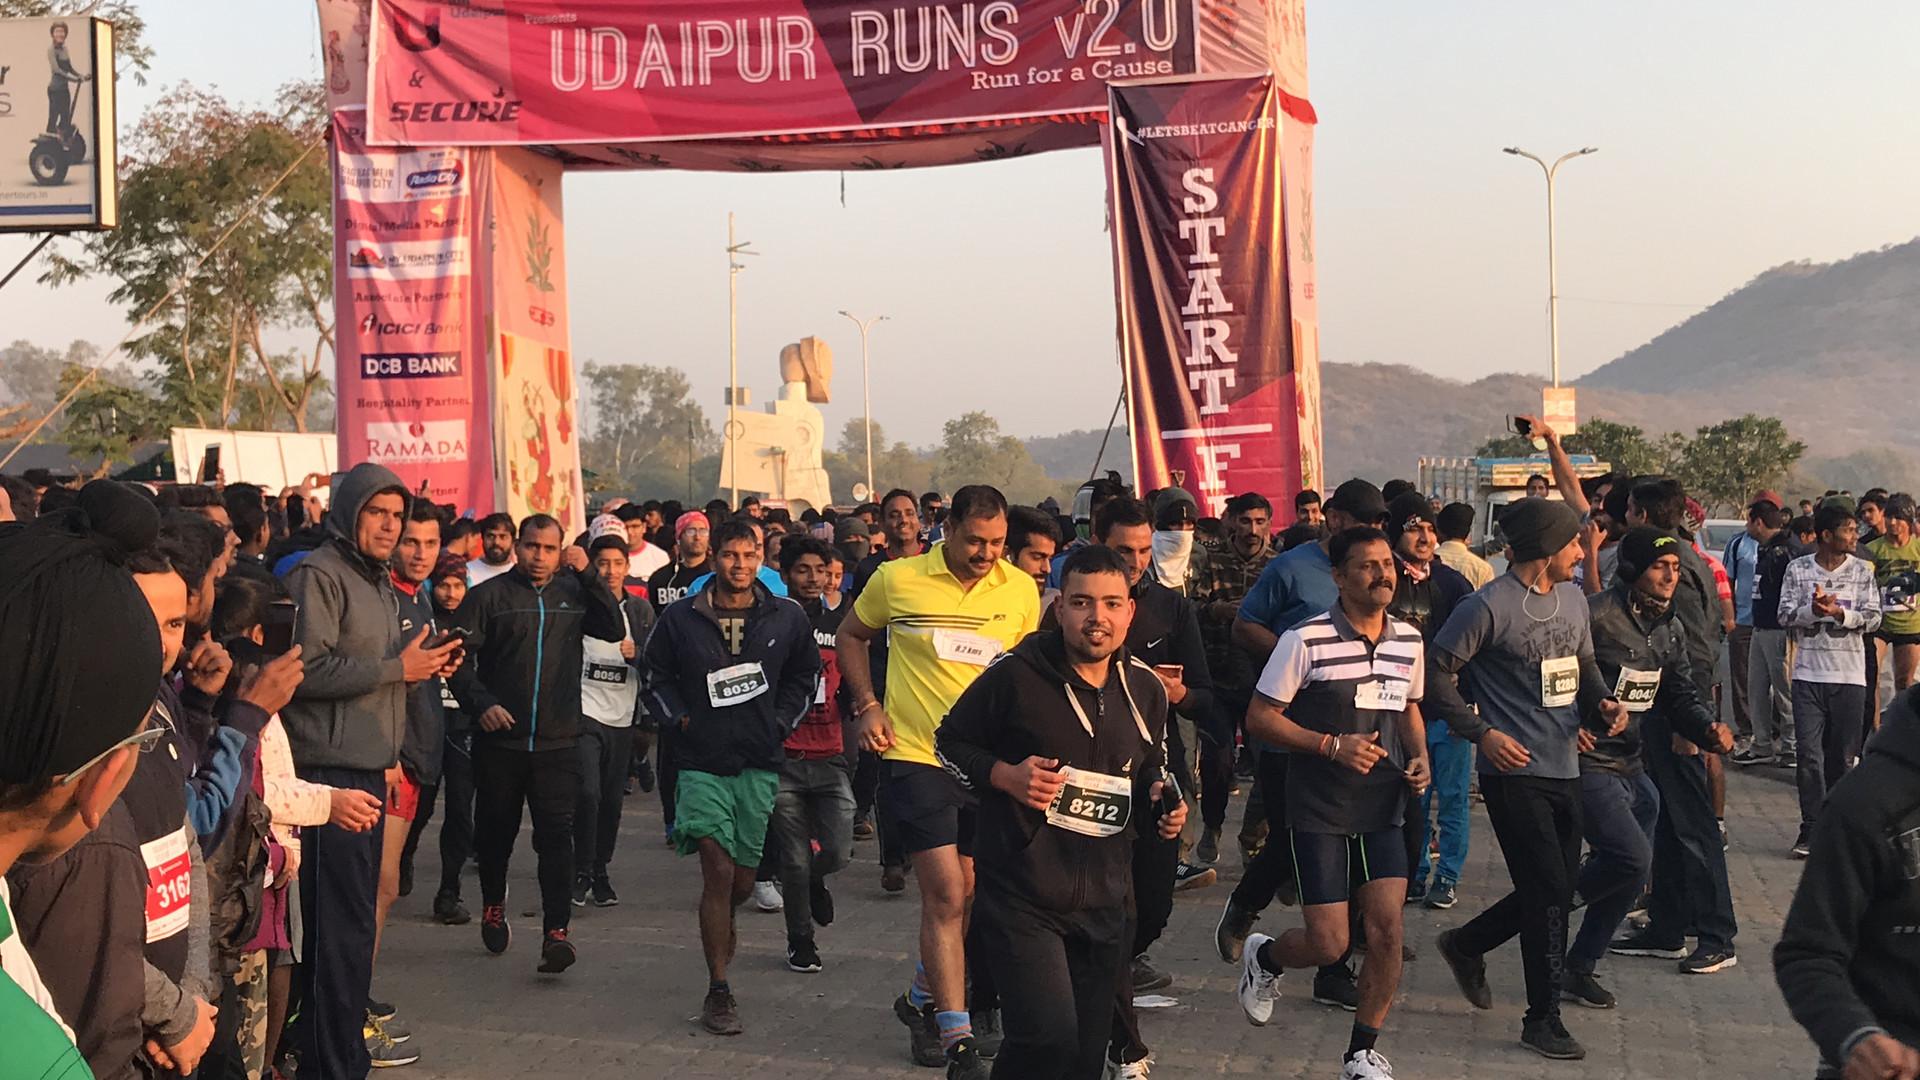 UdaipurRuns_Startingpoint